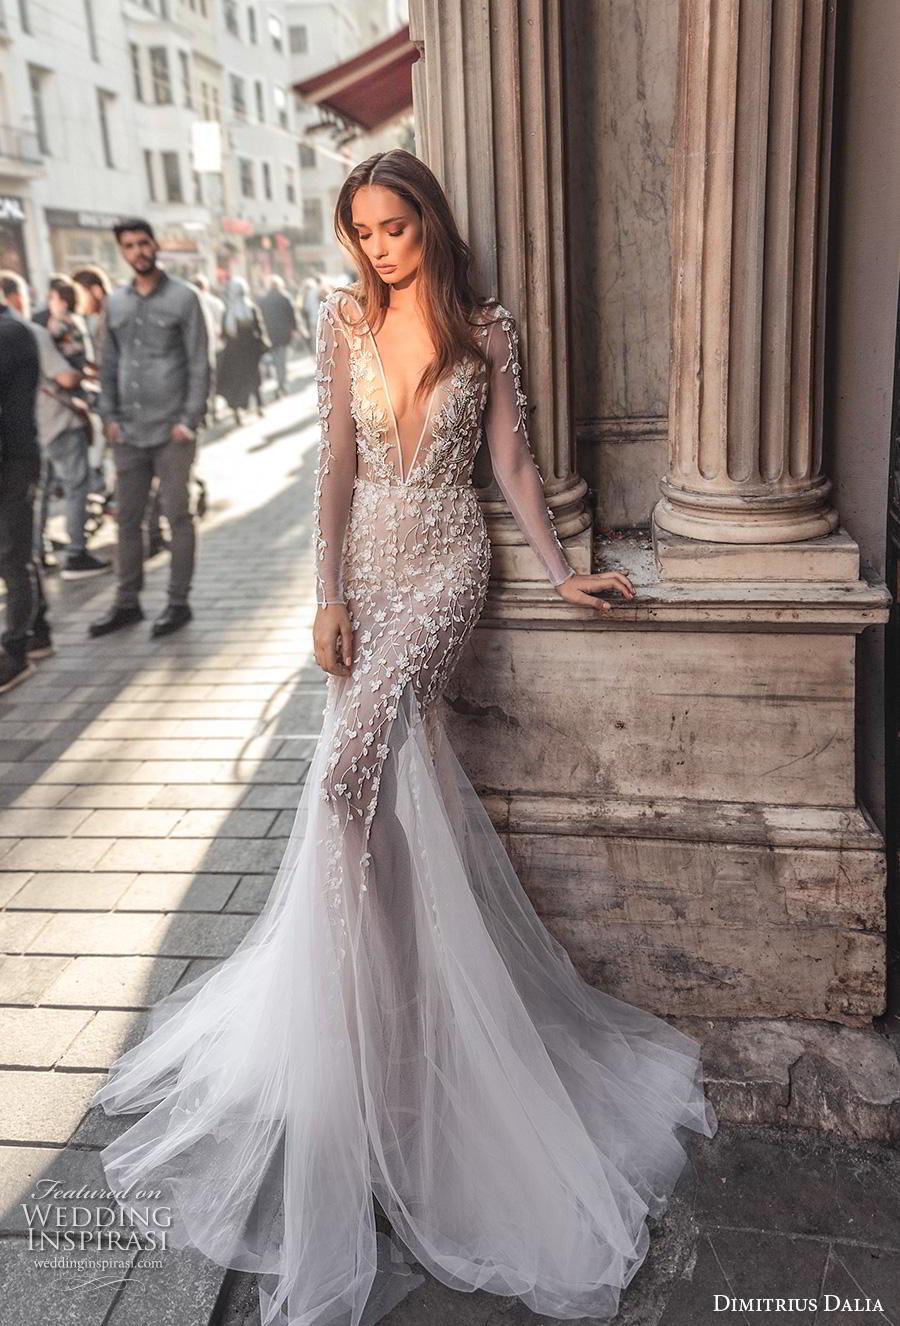 dimitrius dalia 2019 bridal long sleeves deep v neck full embellishment sexy elegant mermaid wedding dress backless low scoop back chapel train (11) mv